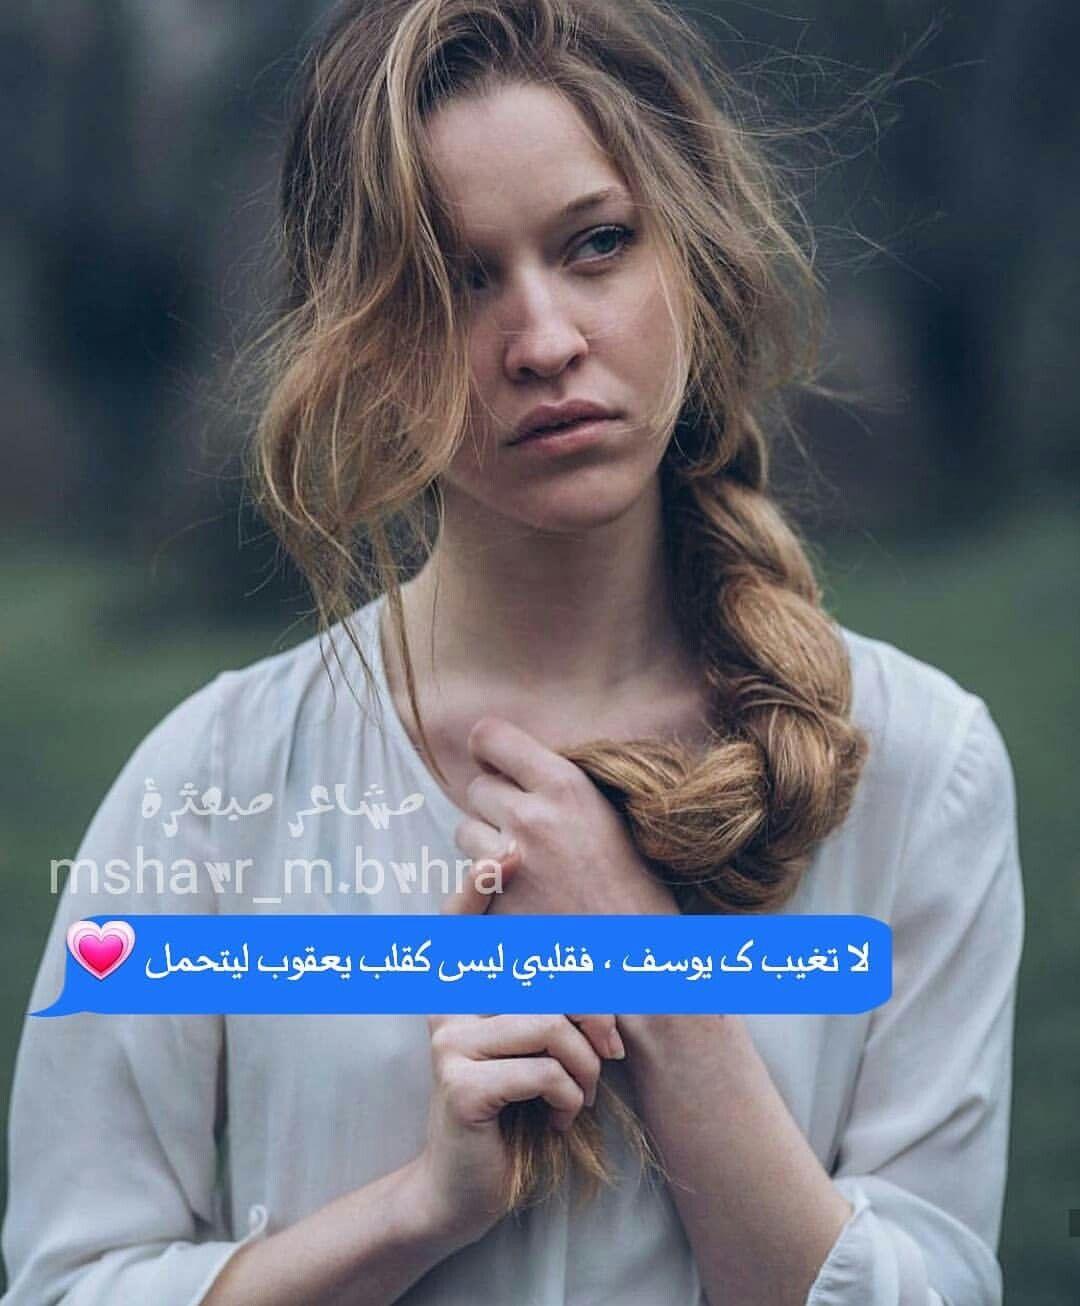 لا تغيب مثل يوسف Funny Captions Beautiful Arabic Words Beauty Skin Care Routine